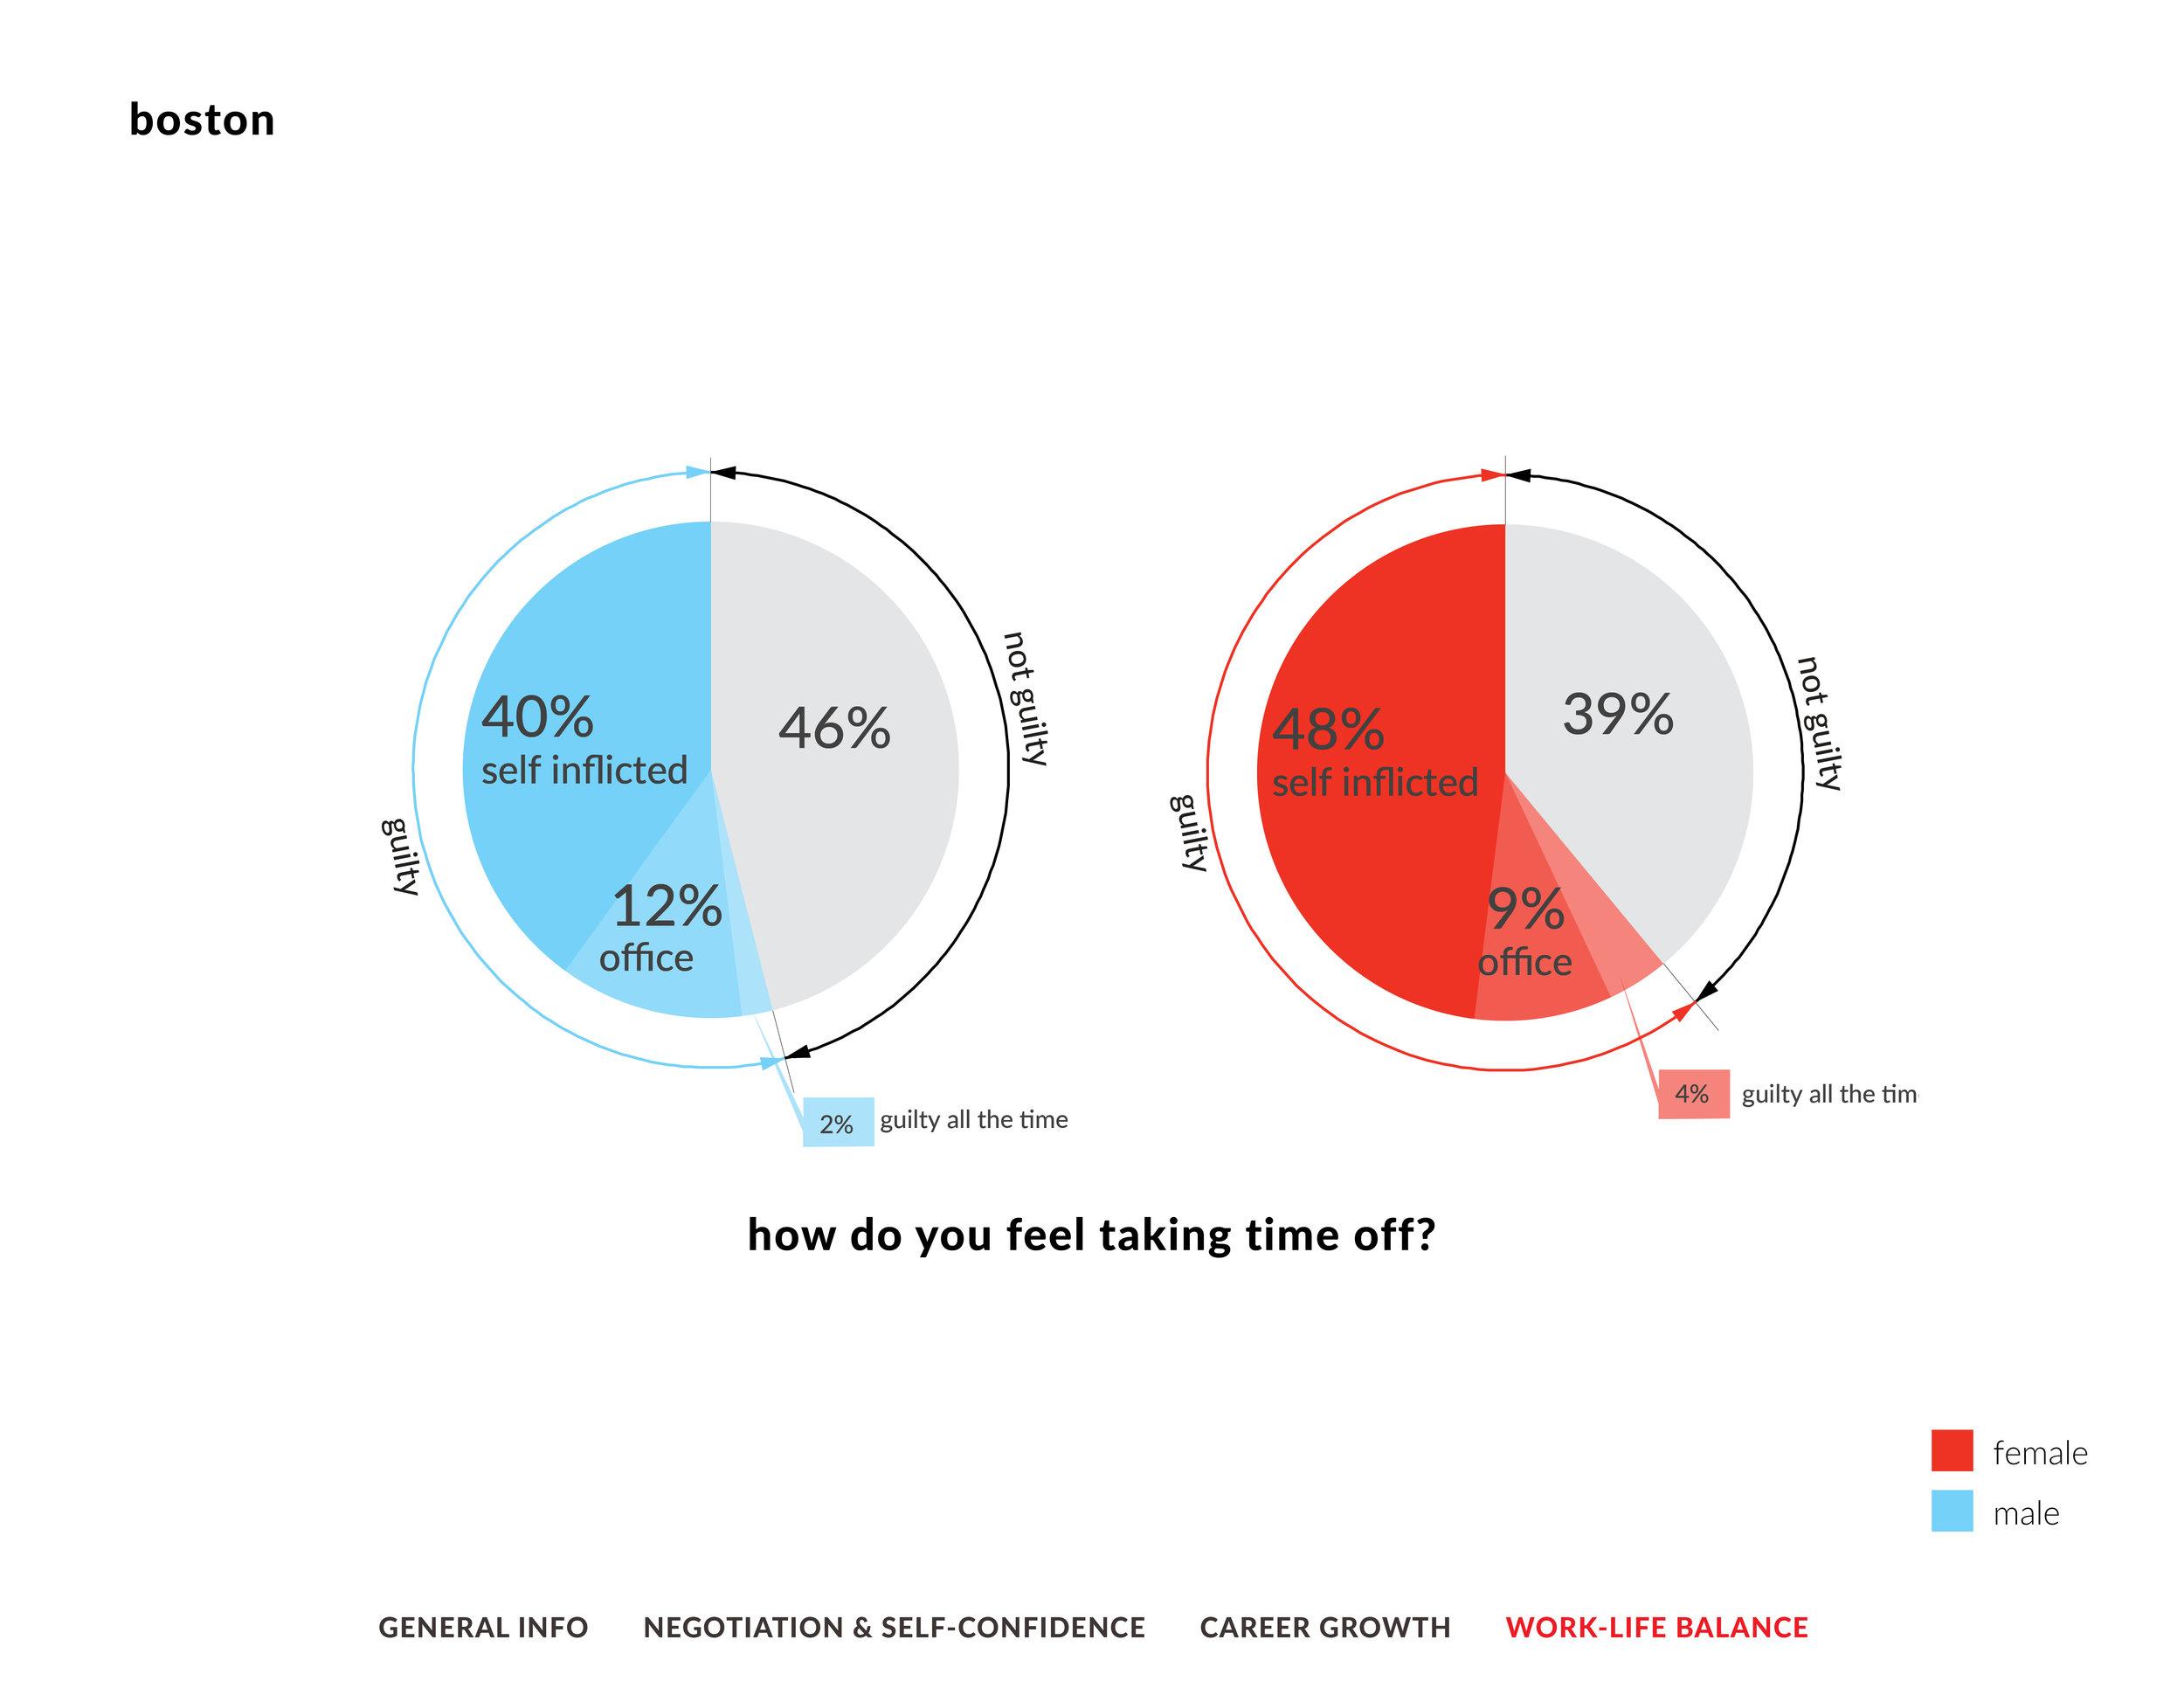 survey results22.5.jpg